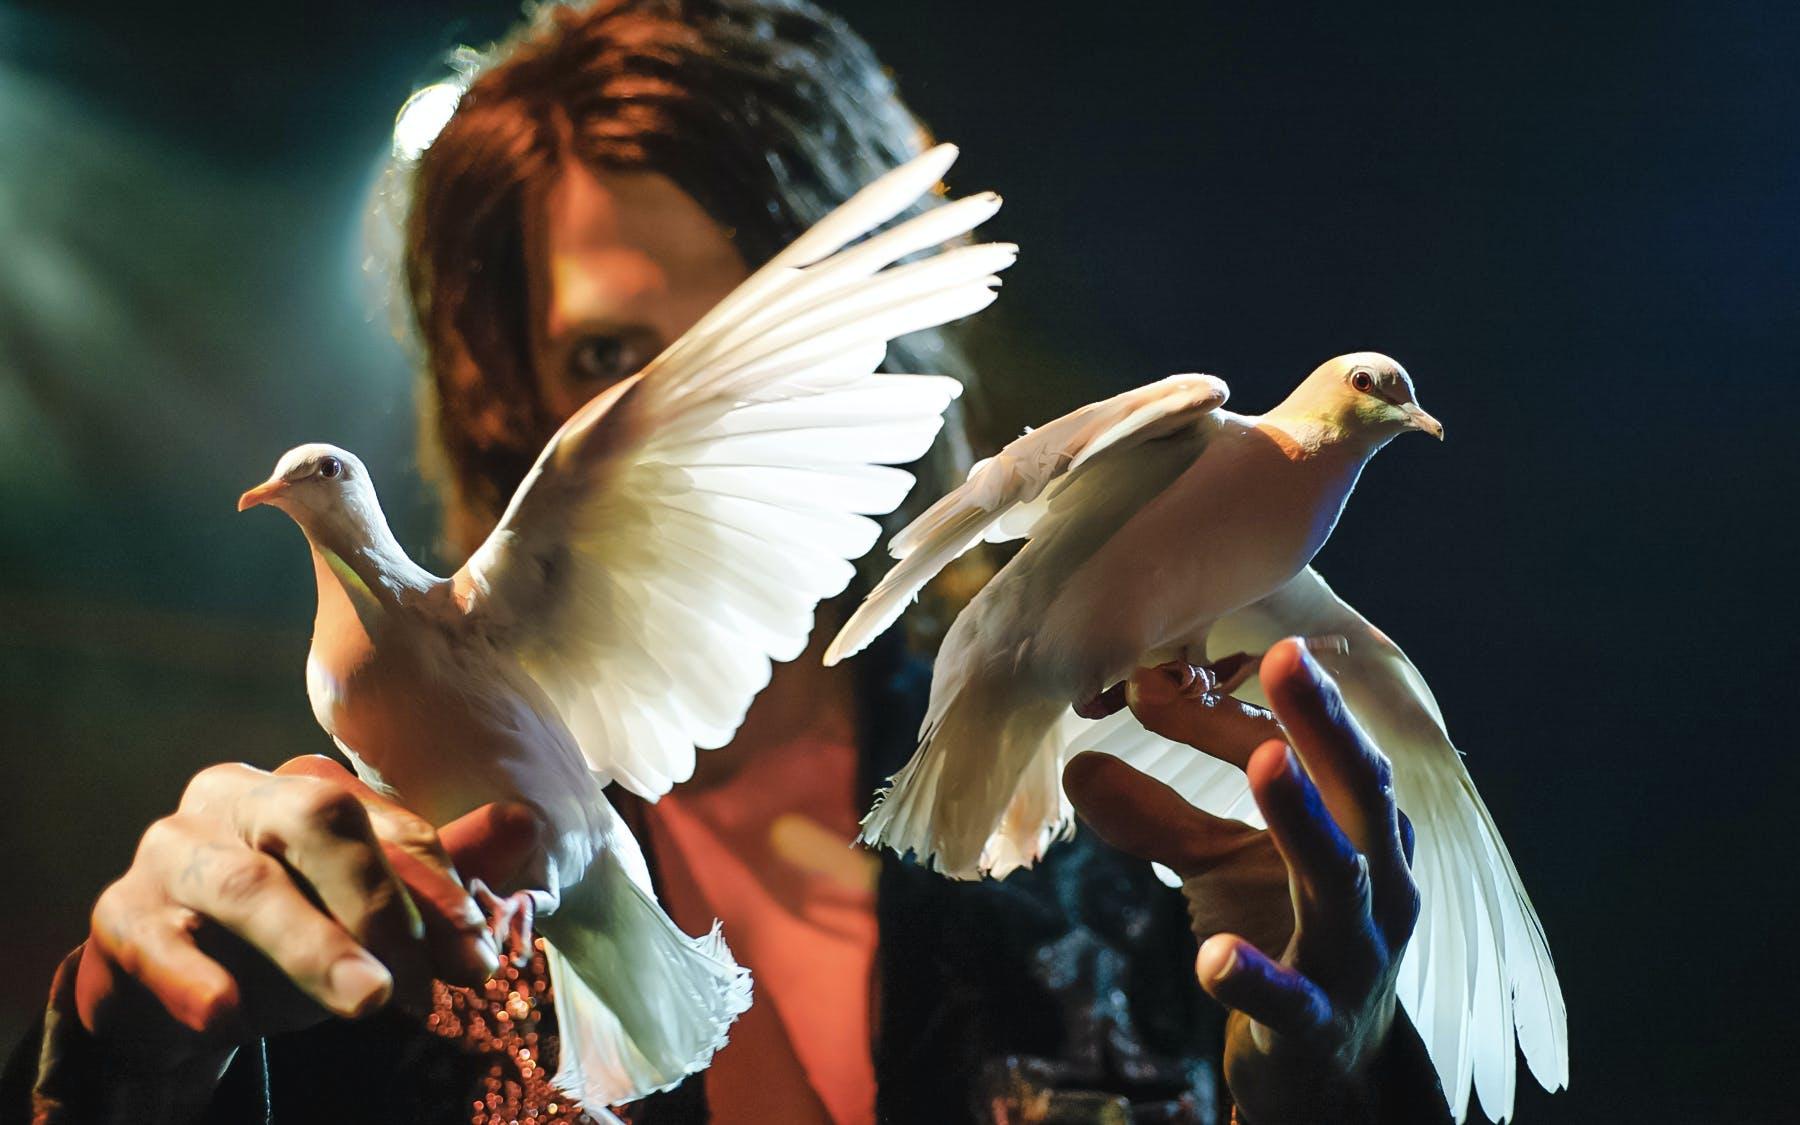 Best Vegas Magic Shows - Criss Angel Cirque Du Soleil